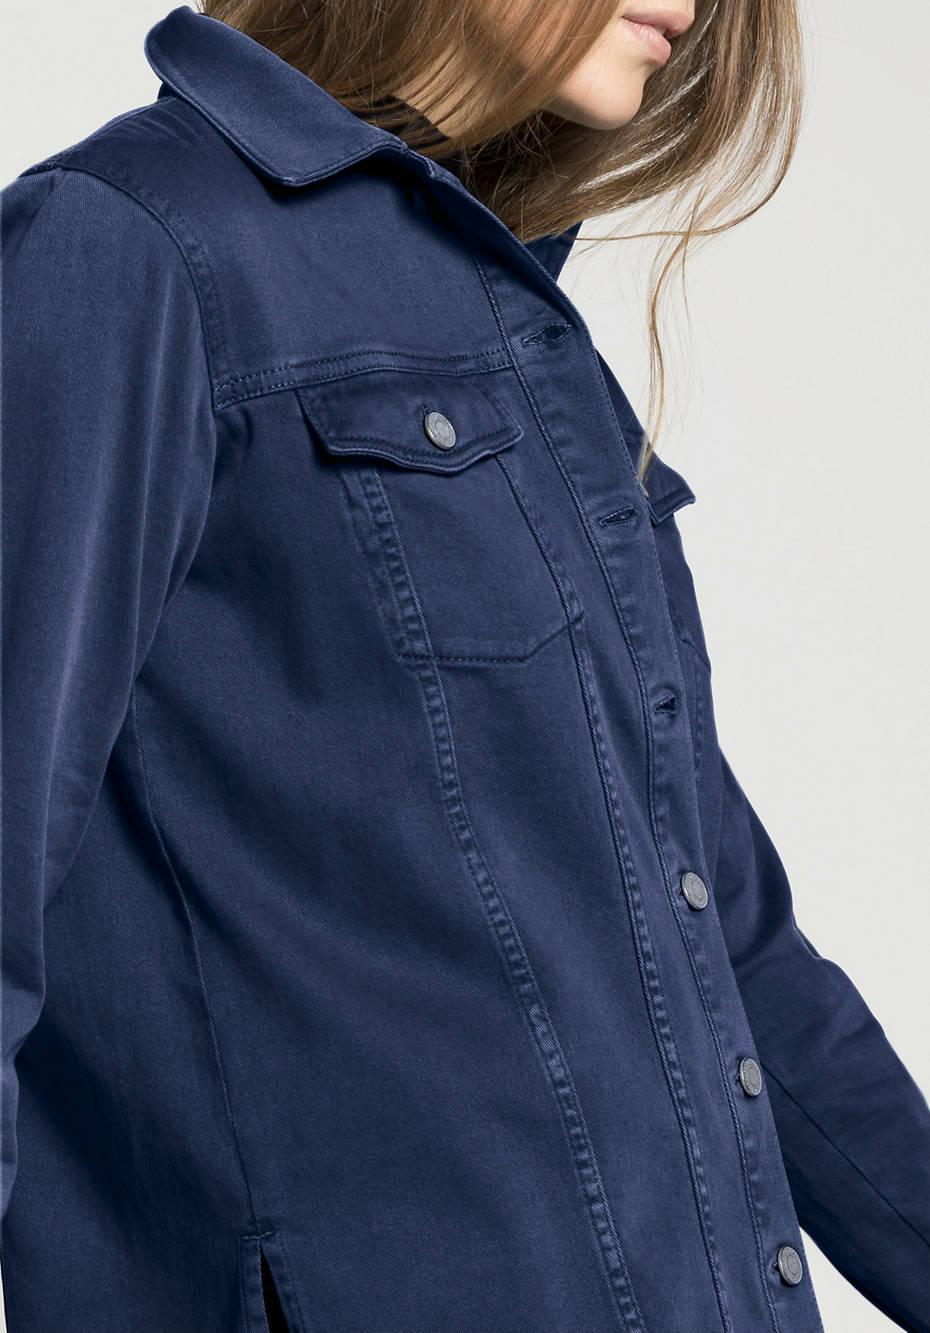 Overshirt aus Bio-Baumwolle